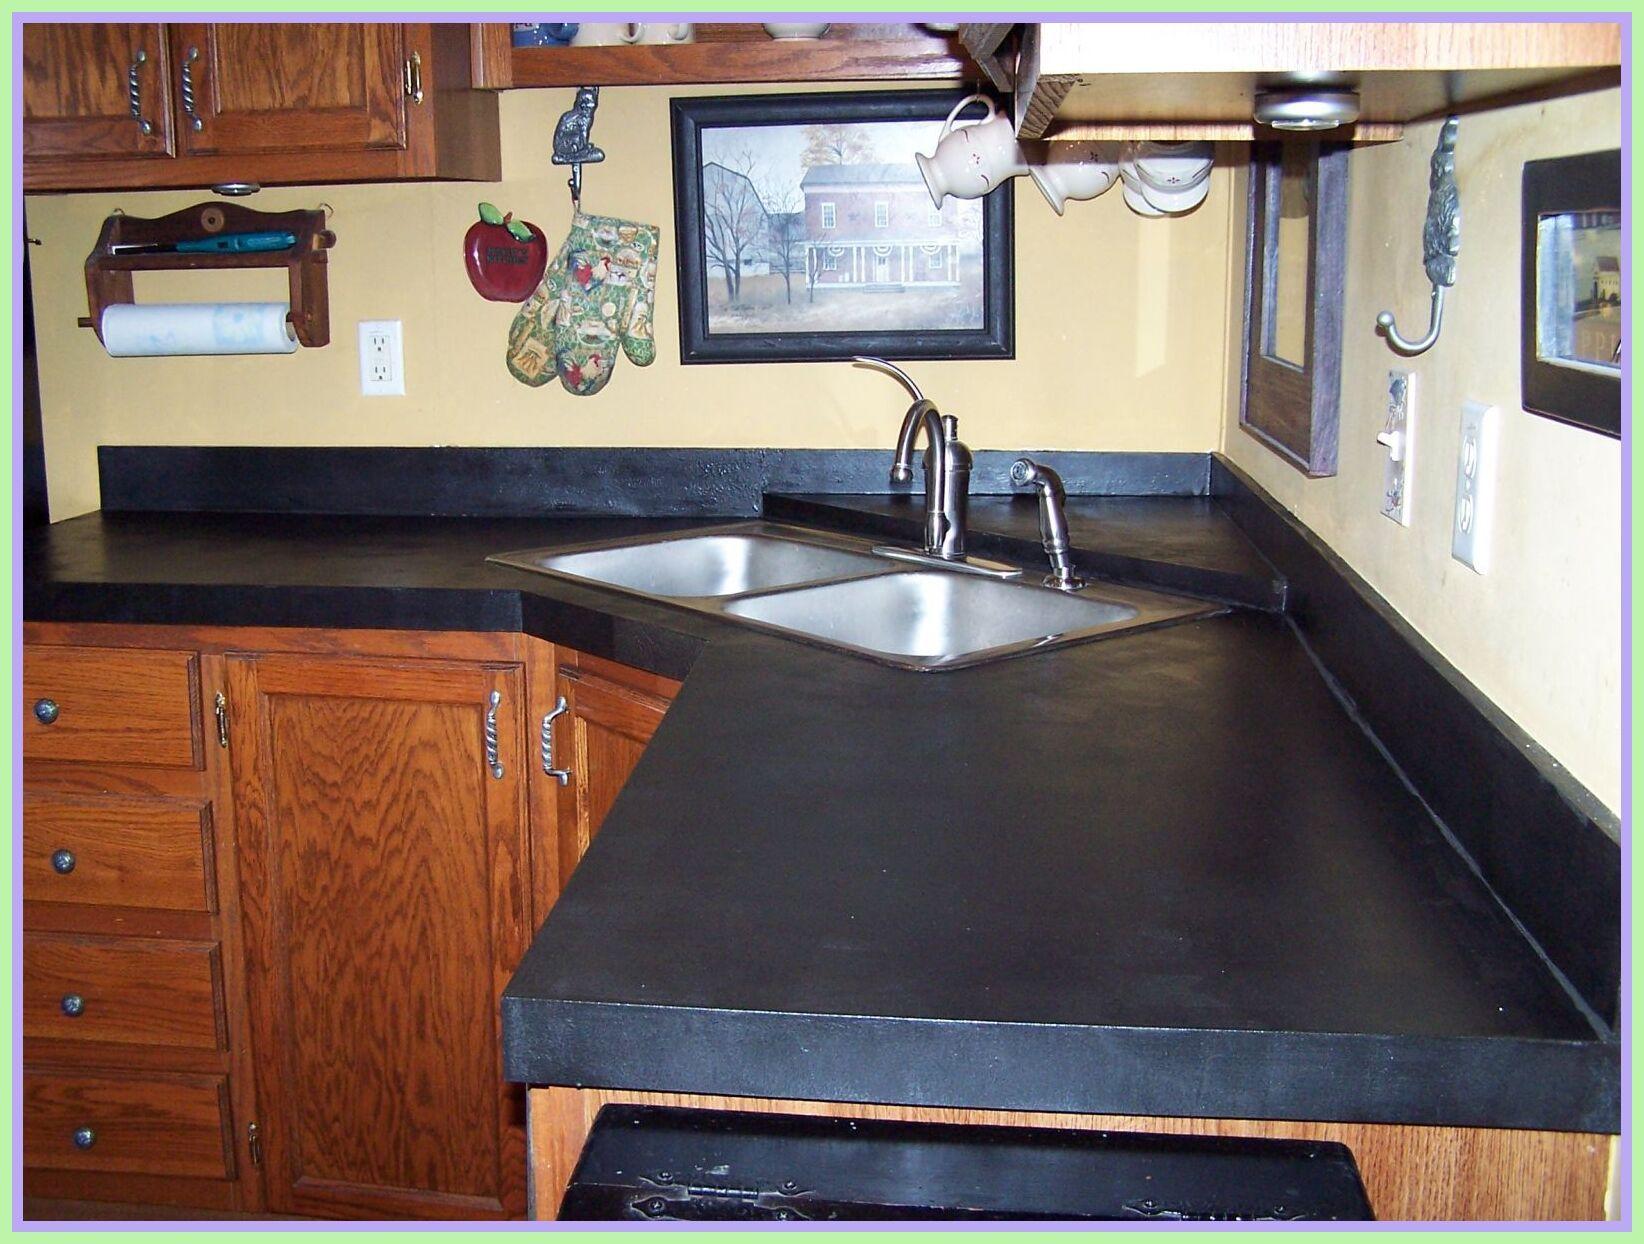 76 Reference Of Concrete Countertops Cost Vs Granite Outdoor Kitchen Countertops Kitchen Sink Design Corner Sink Kitchen